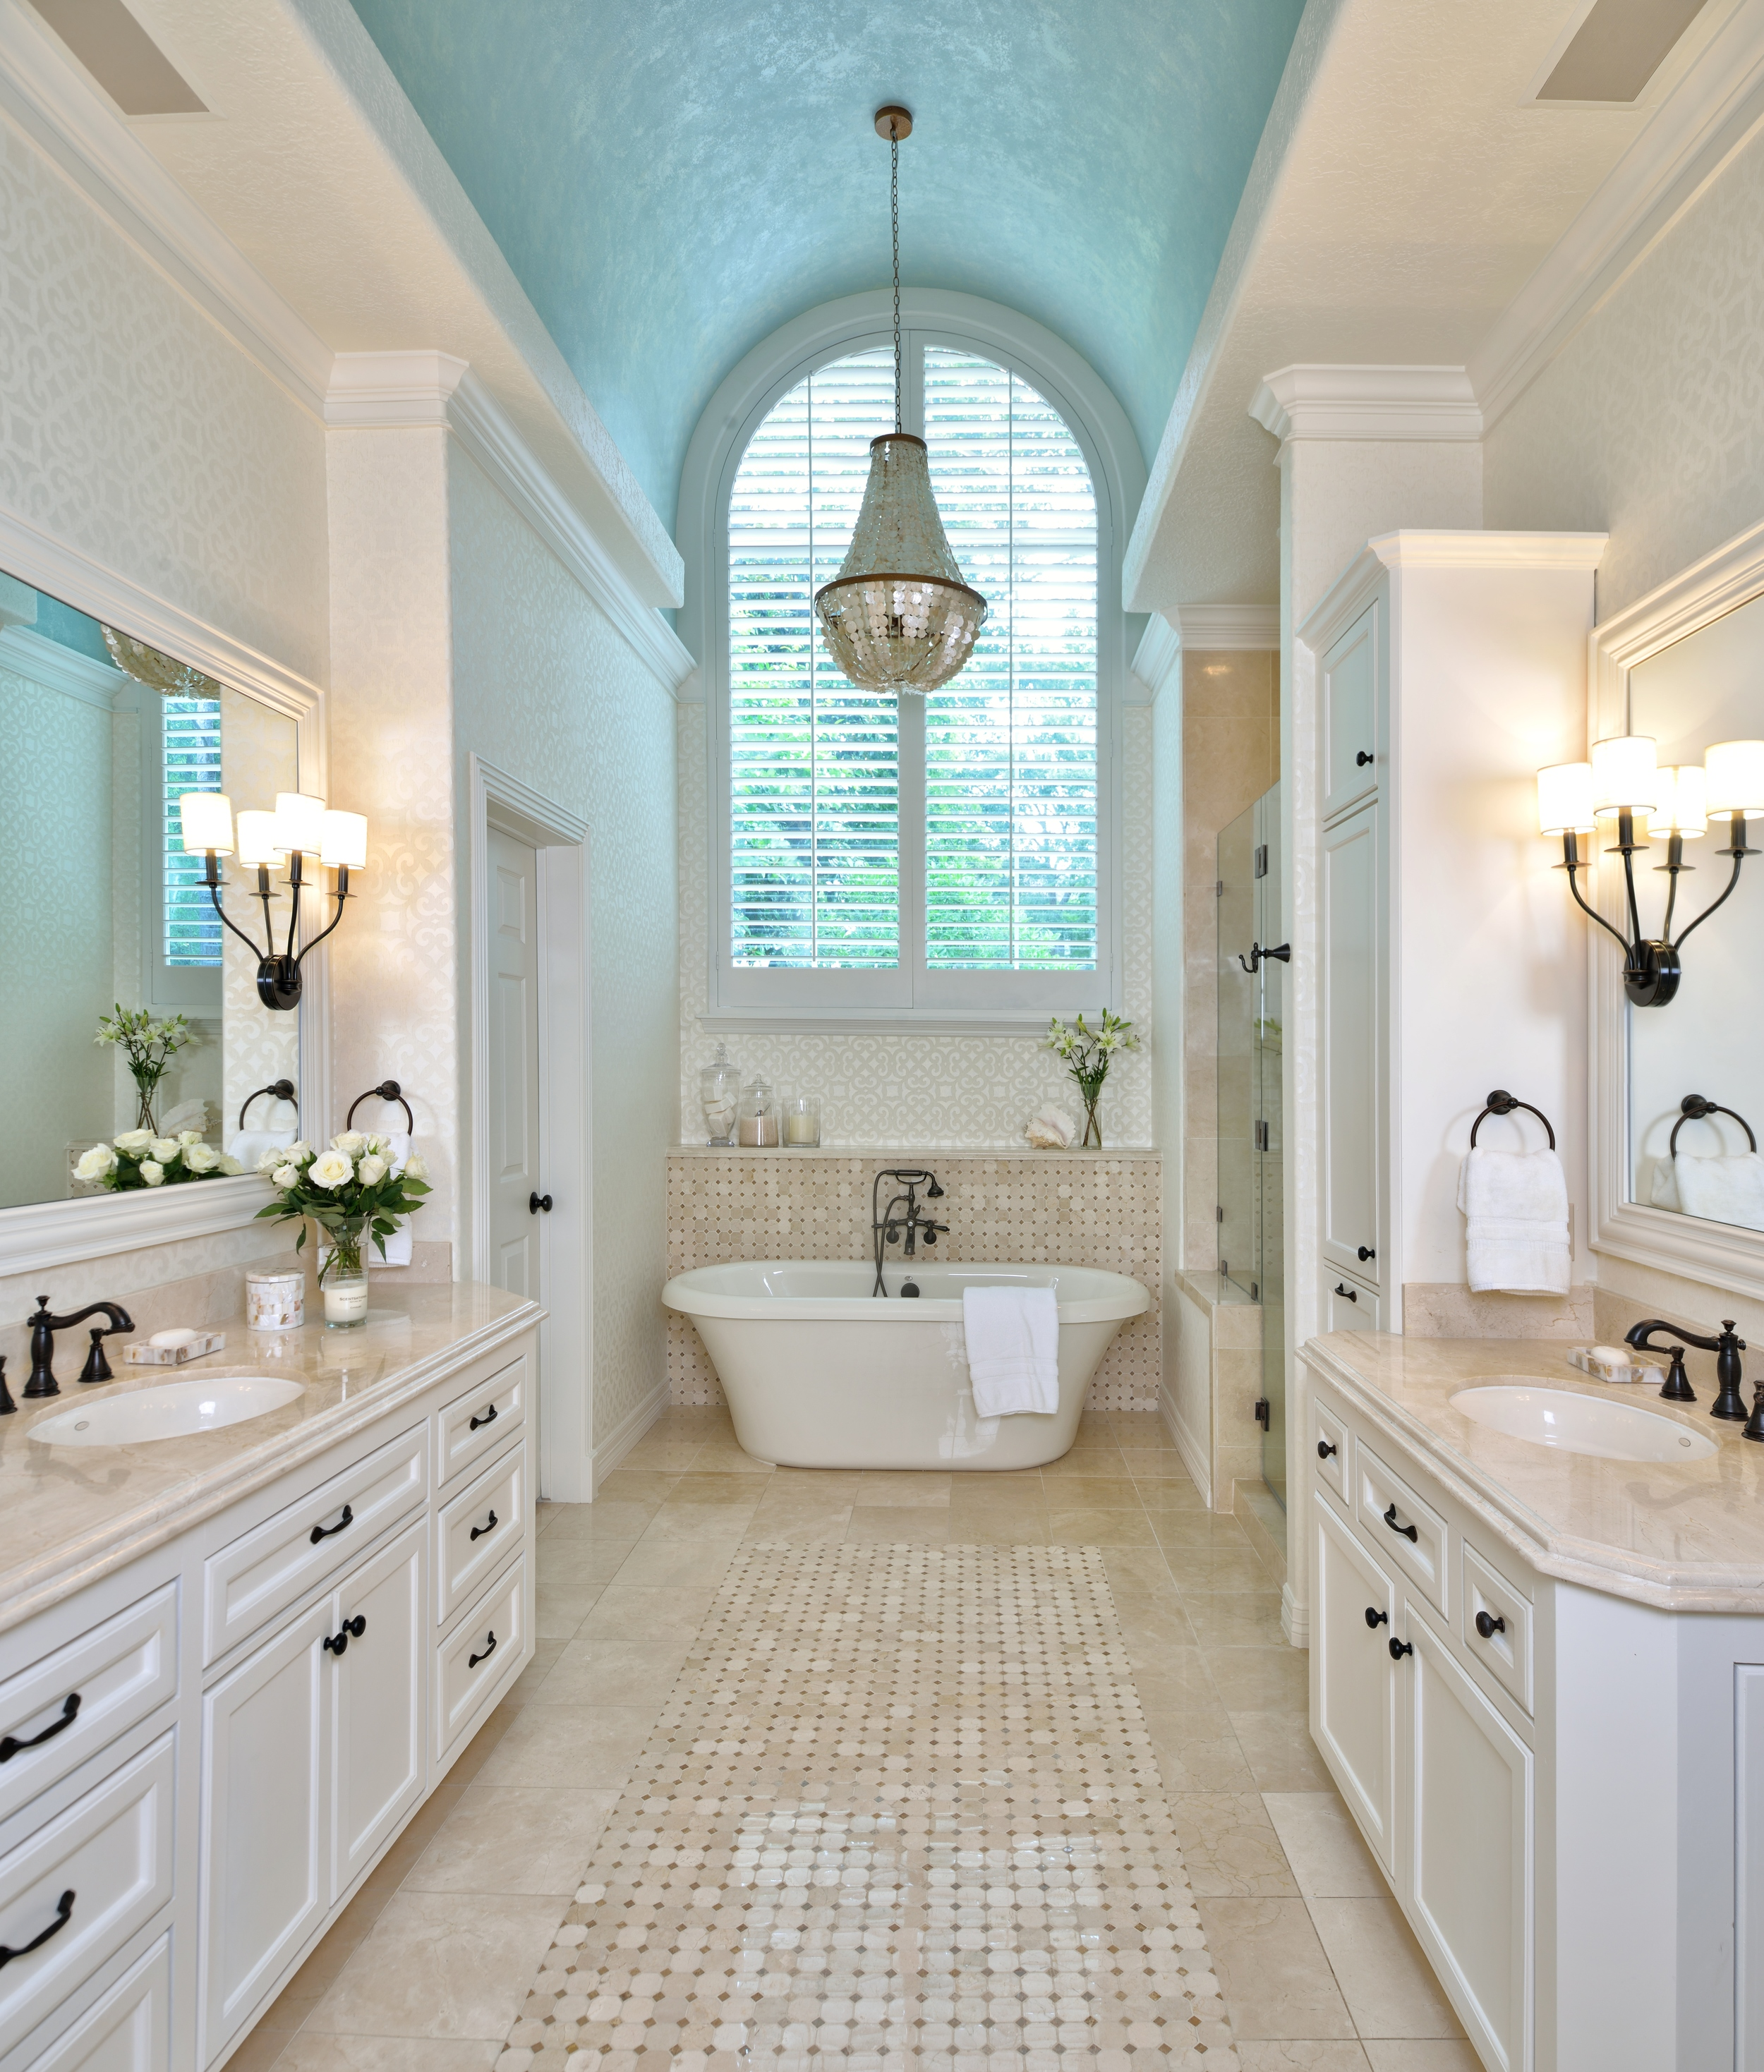 Partial Bathroom Remodel Gets A Dramatic Facelift, Designer: Carla Aston